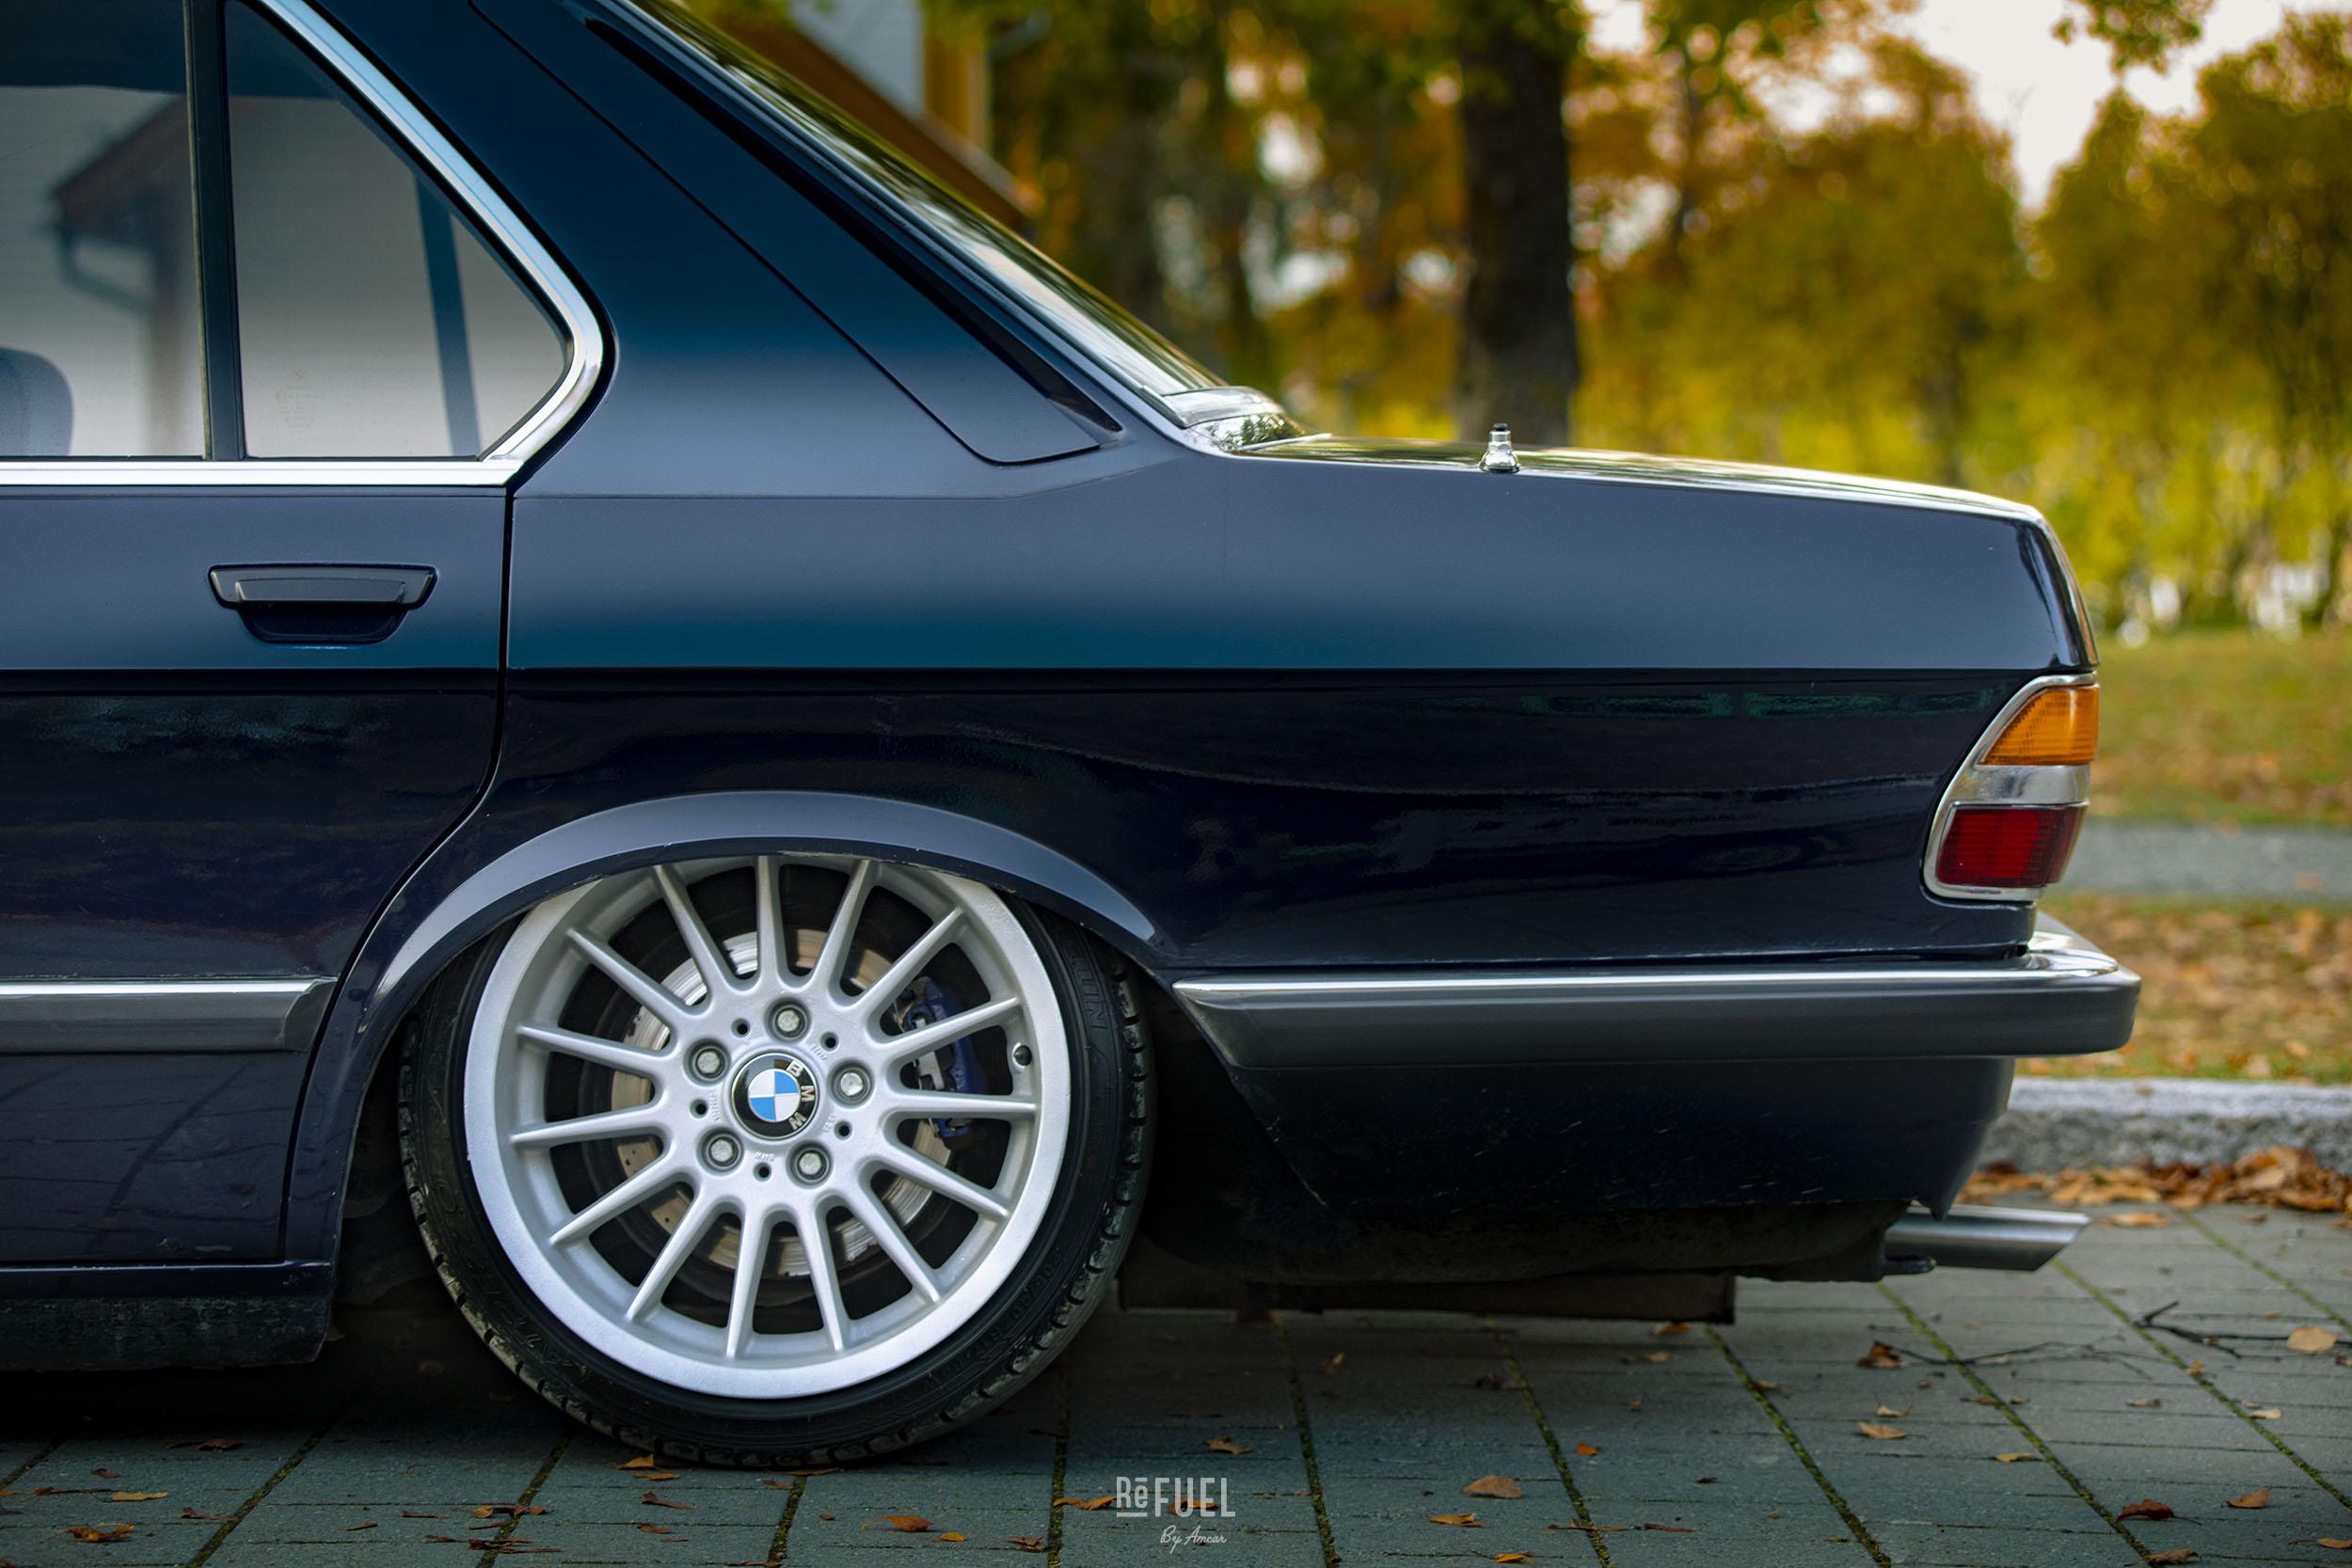 Originale BMW Style 32-felger!